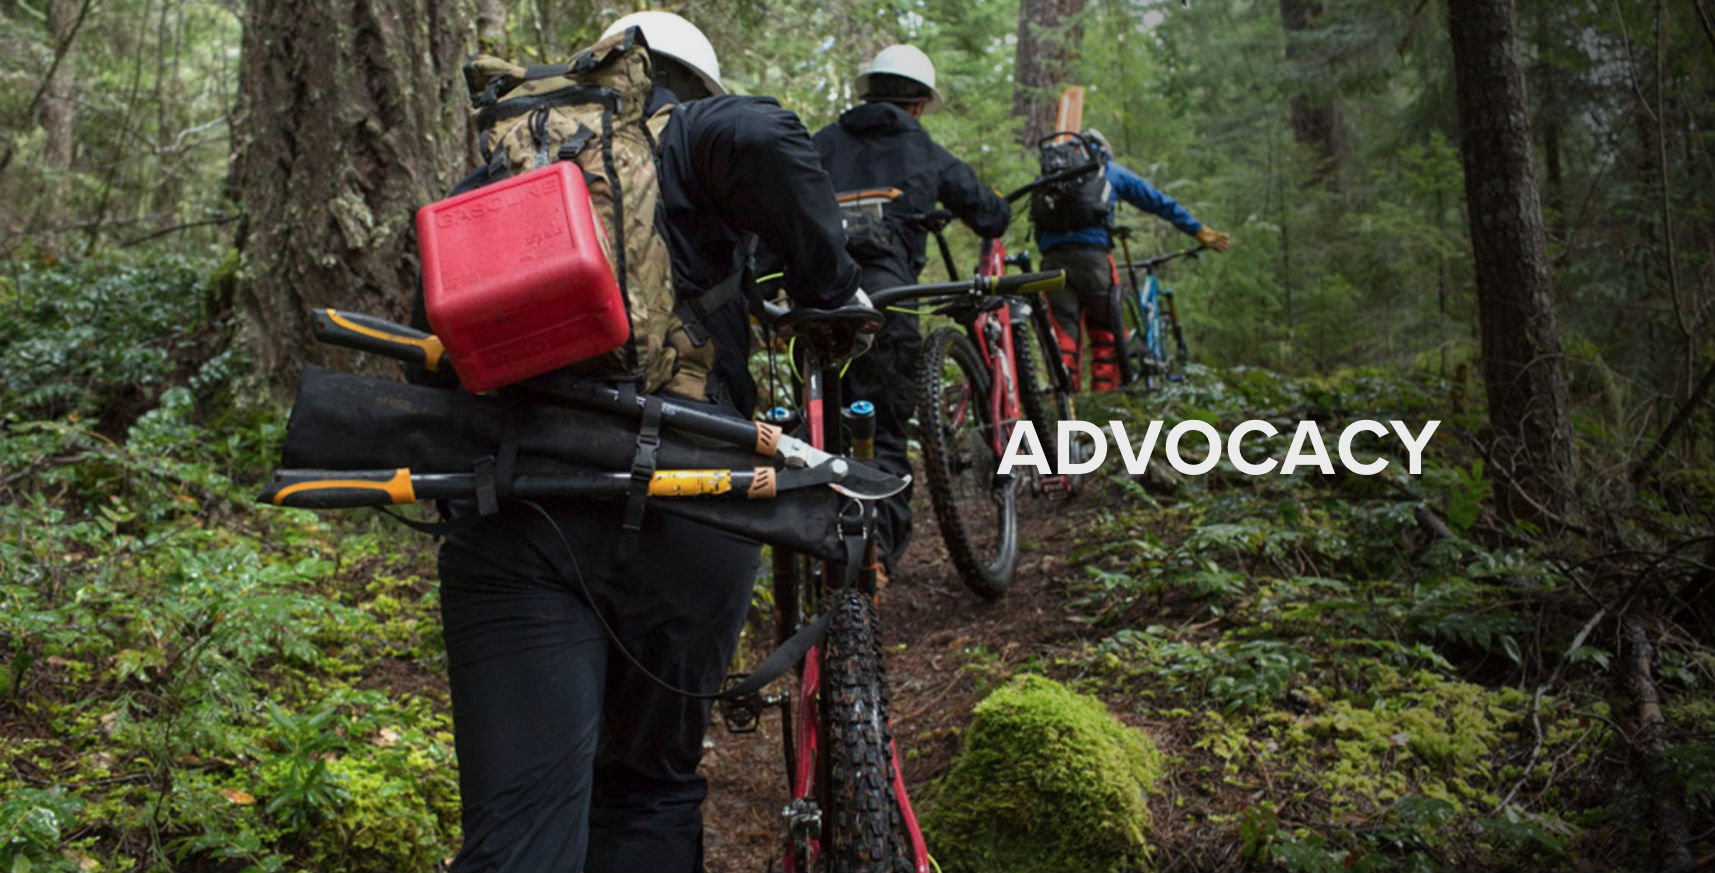 Santa Cruz Bicycles Endorses the STC as an Advocacy Organization